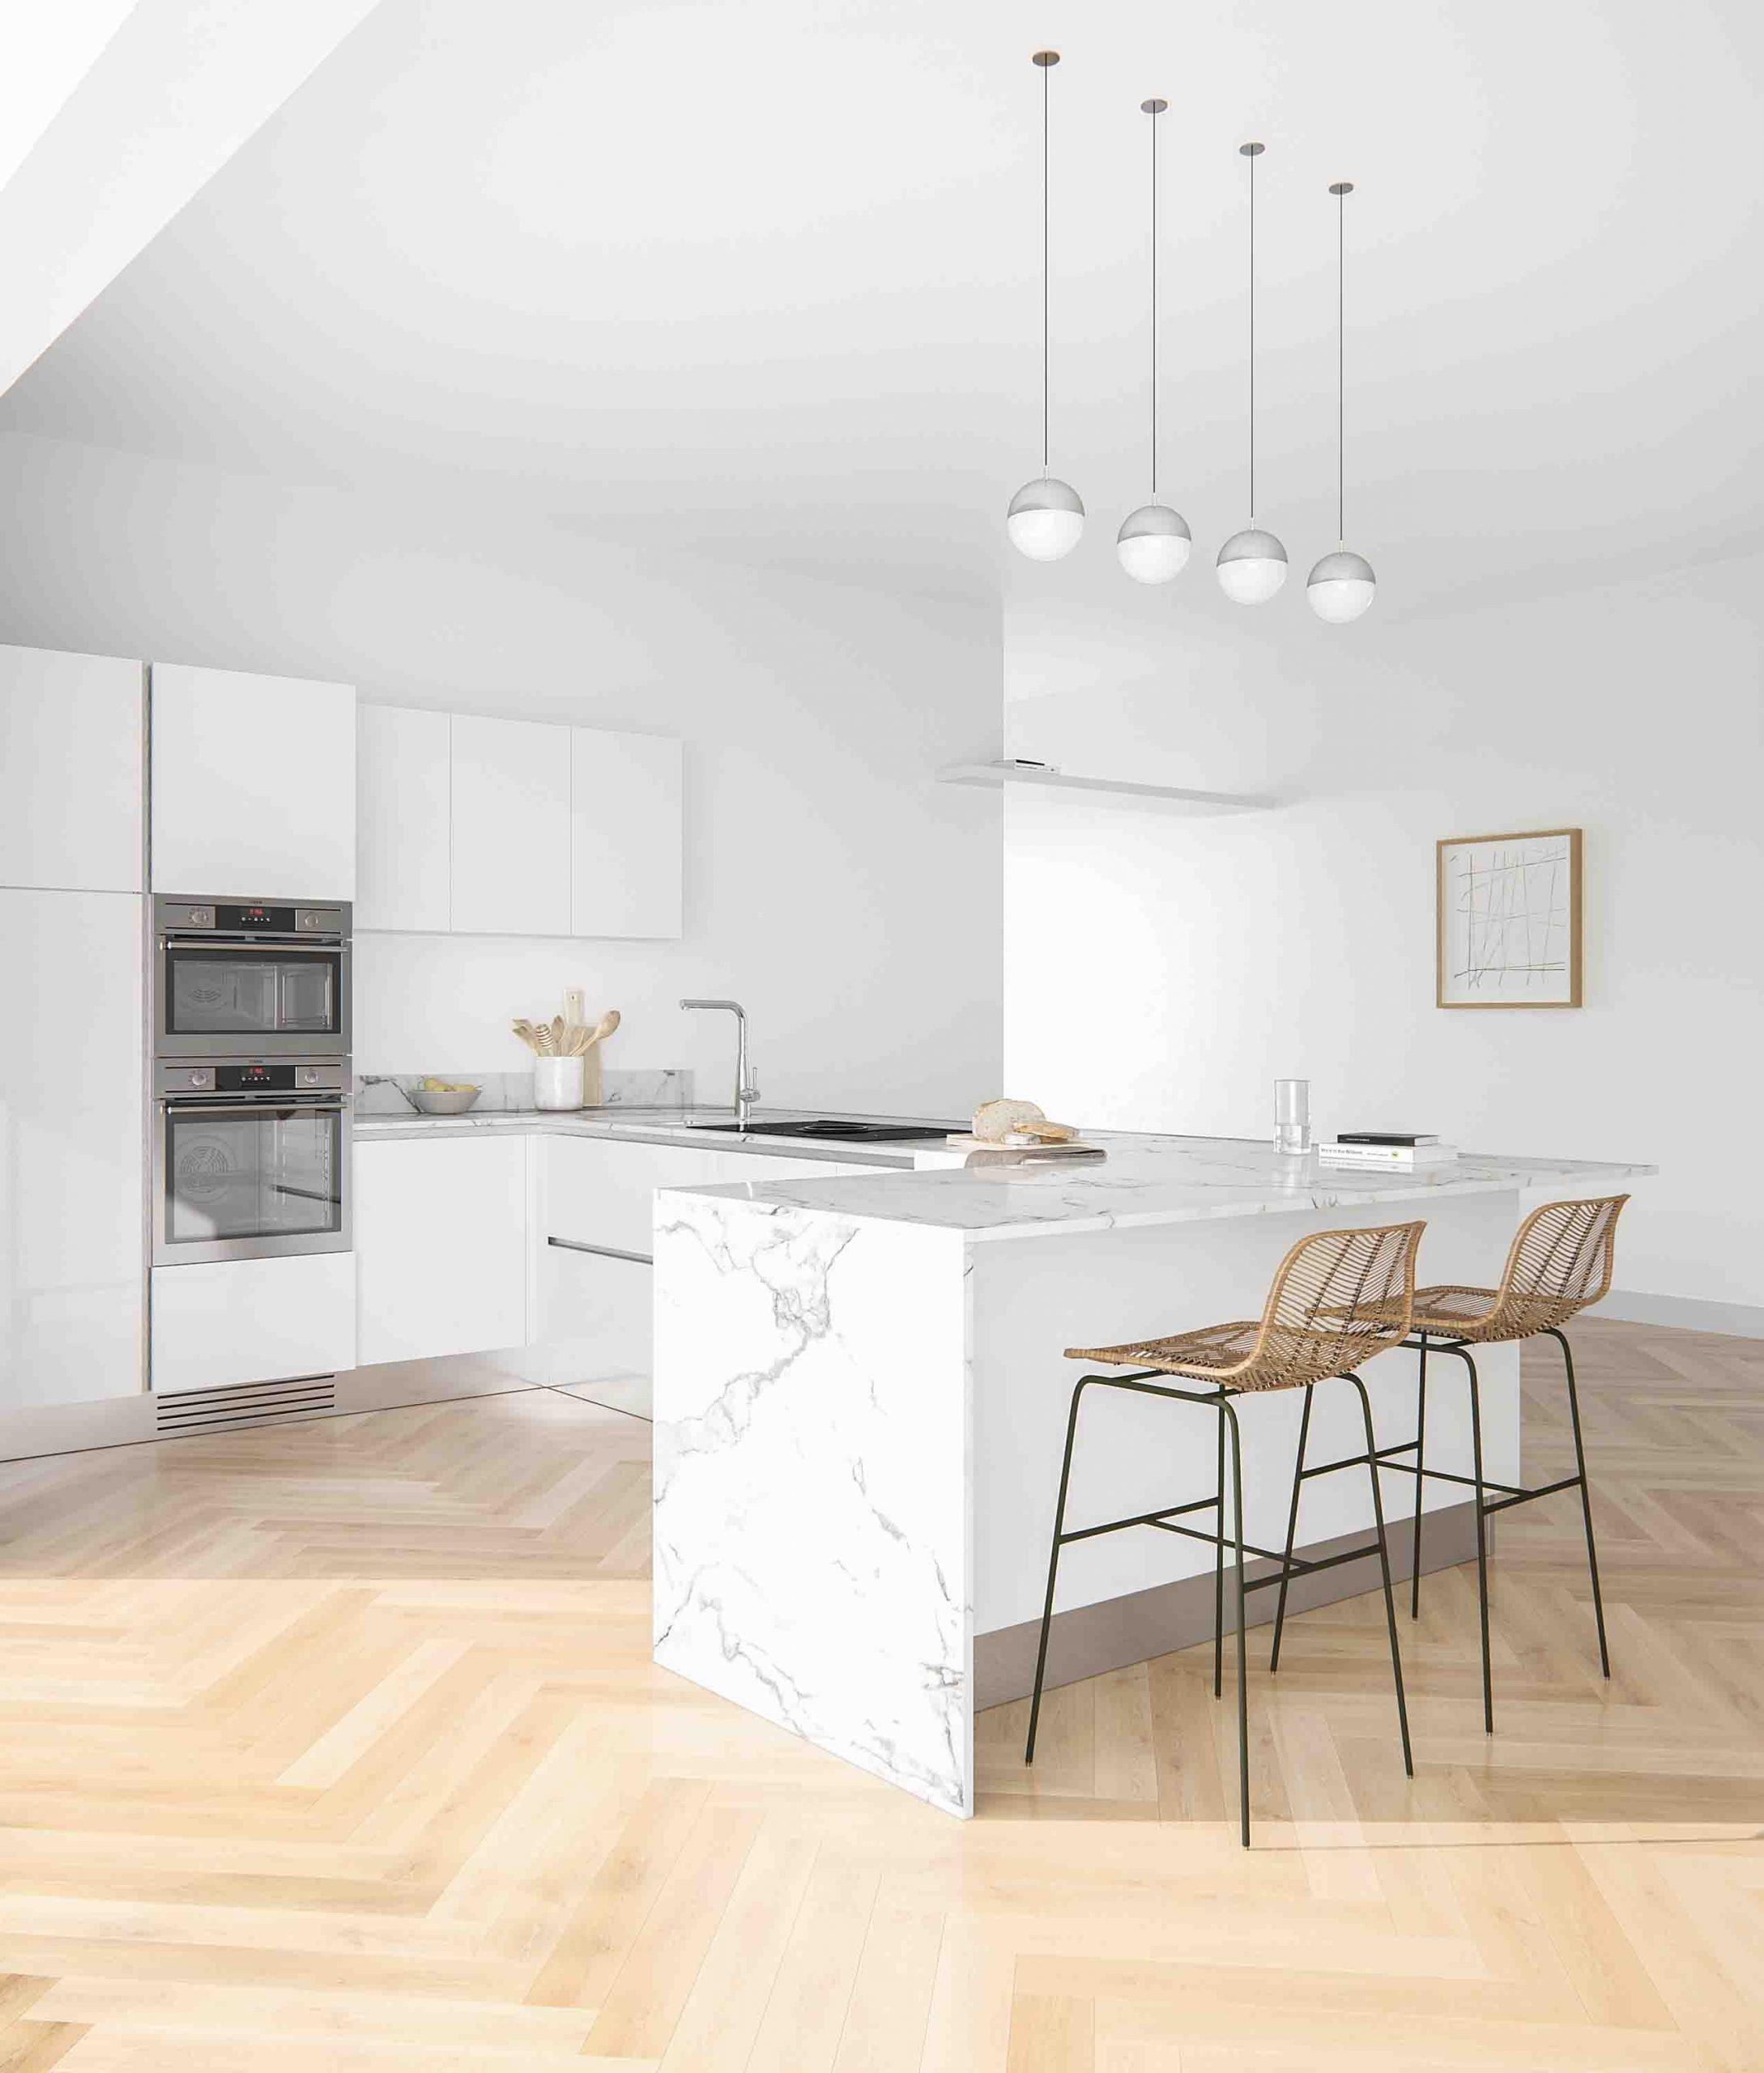 https://dprostudio.com/wp-content/uploads/2021/01/GRIXTI01_kitchen_blanche_hq_cam2-scaled.jpg